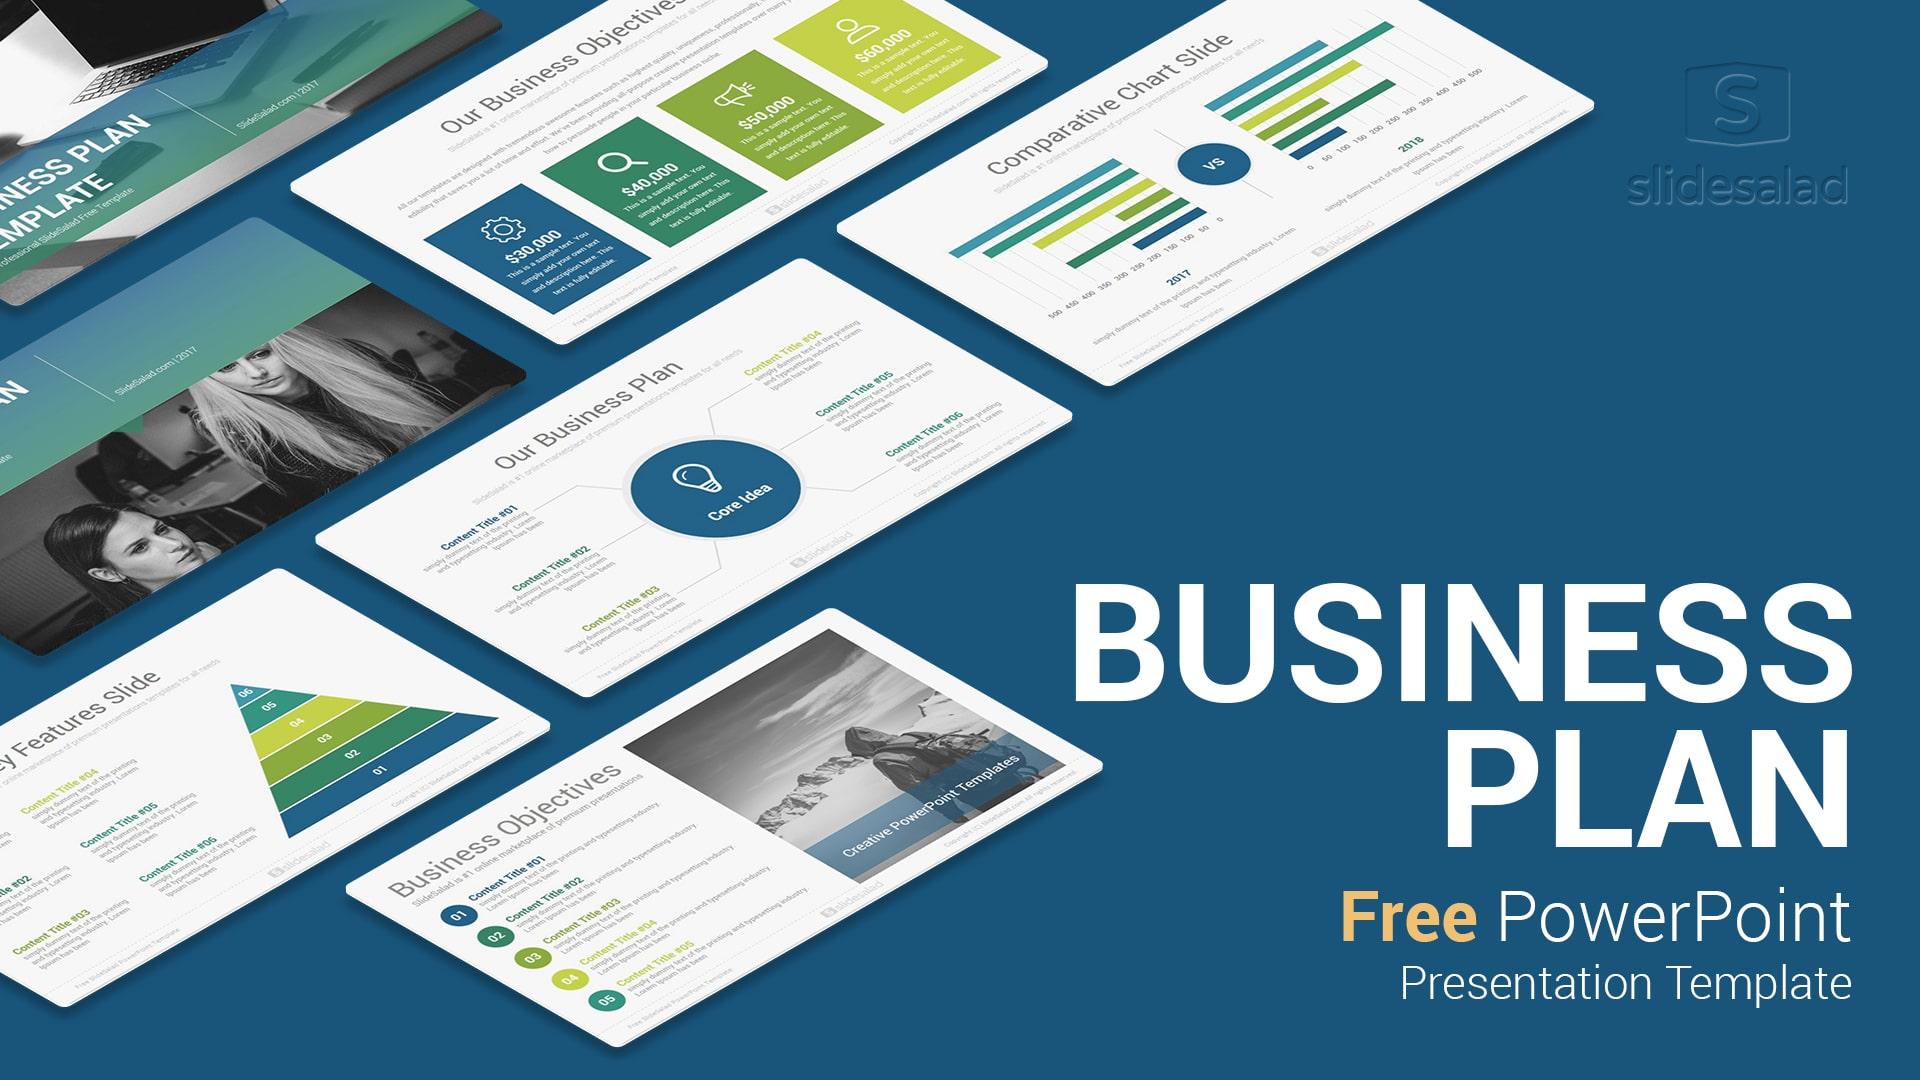 Business Plan Free Powerpoint Presentation Template